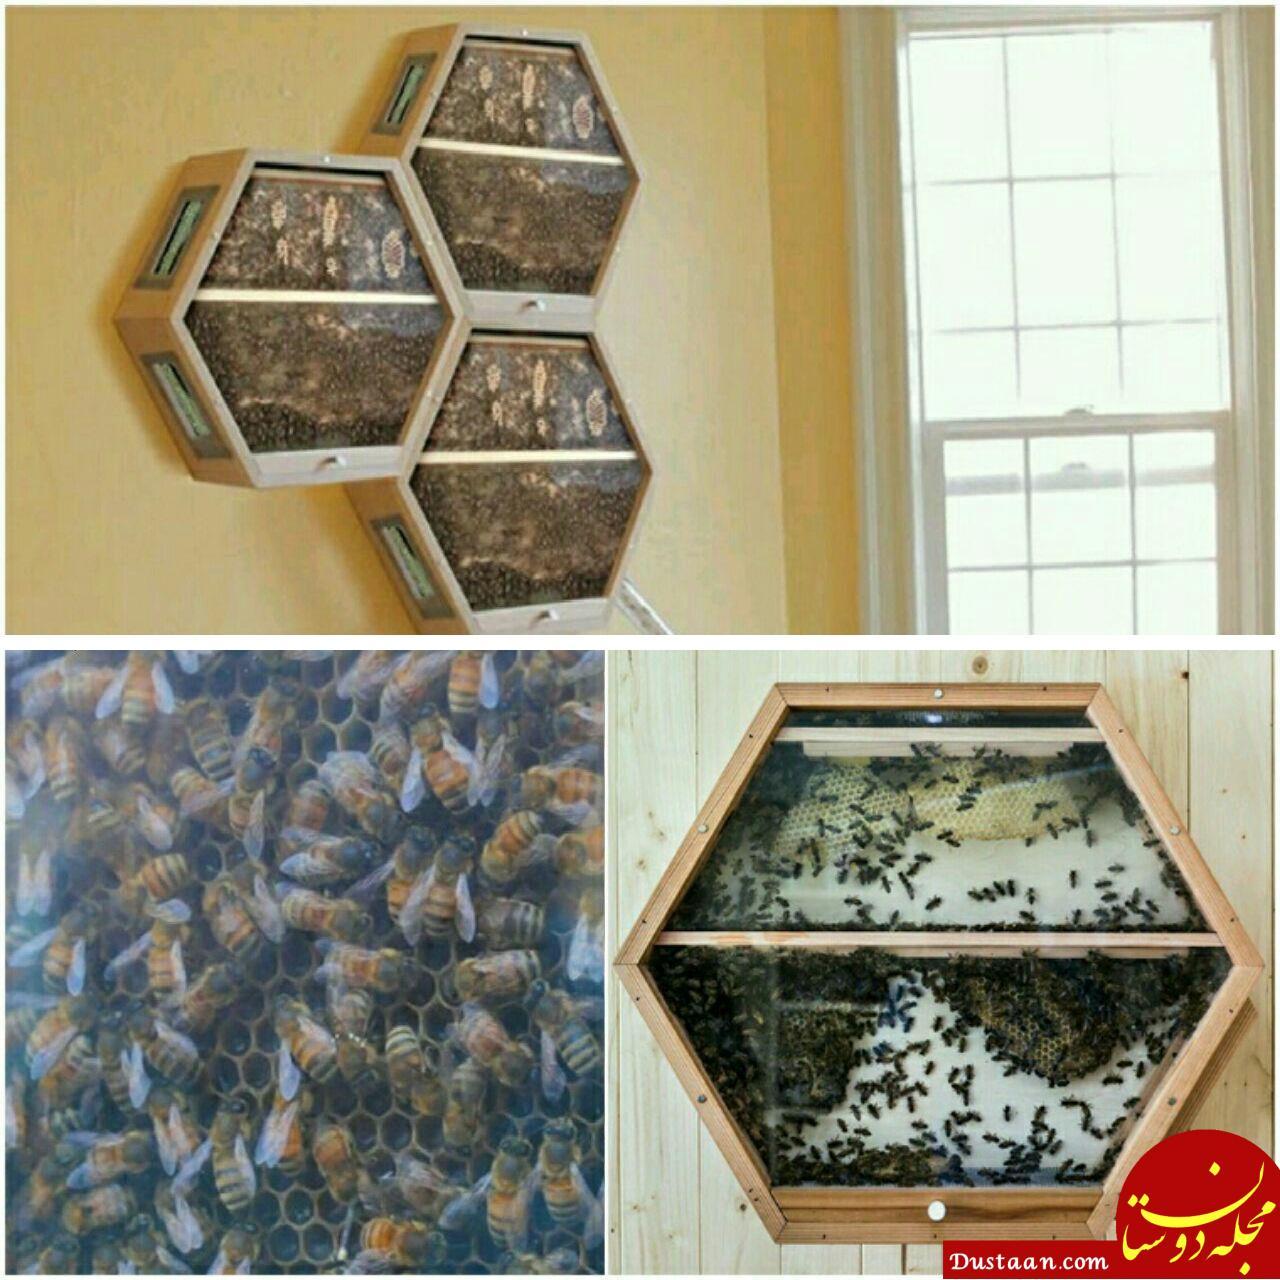 www.dustaan.com روشی جدید برای پرورش زنبور عسل در خانه! +عکس